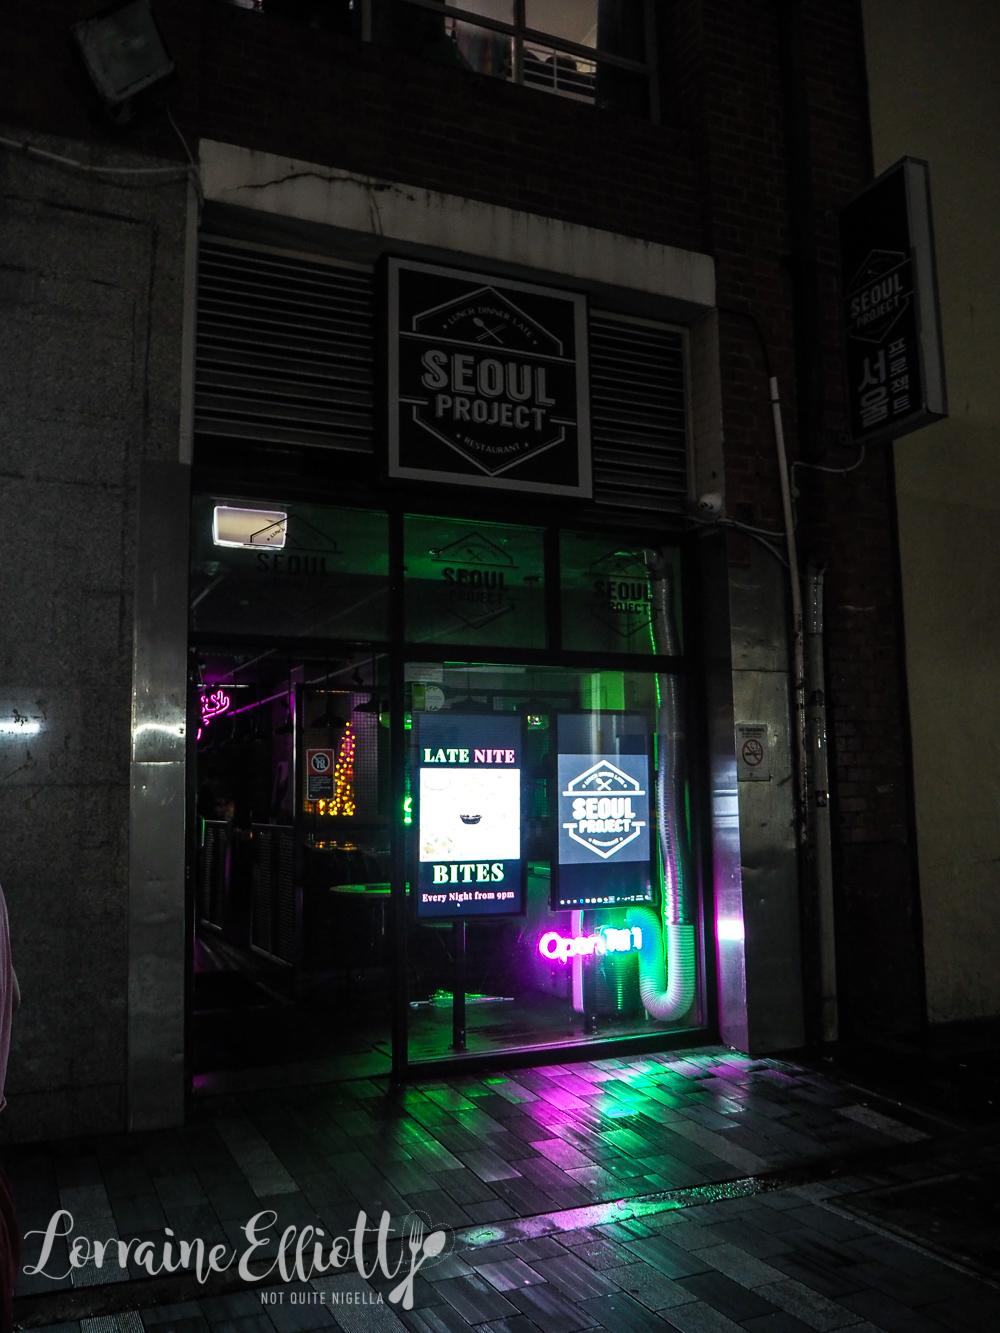 Seoul Project Sydney